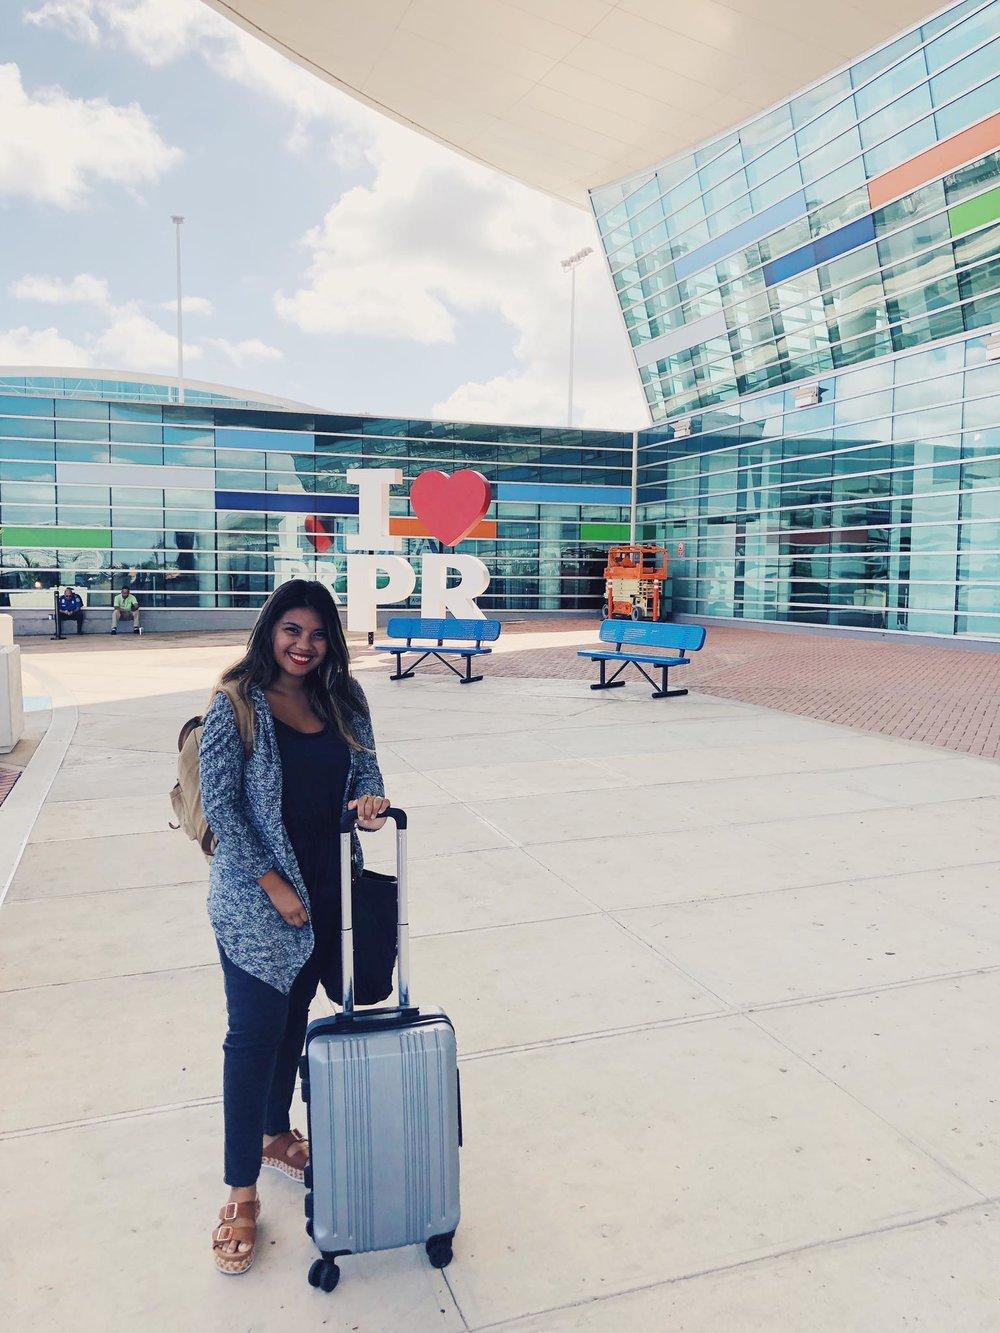 Kach Solo Travels in 2019 Hello from Madrid, Spain3.jpg